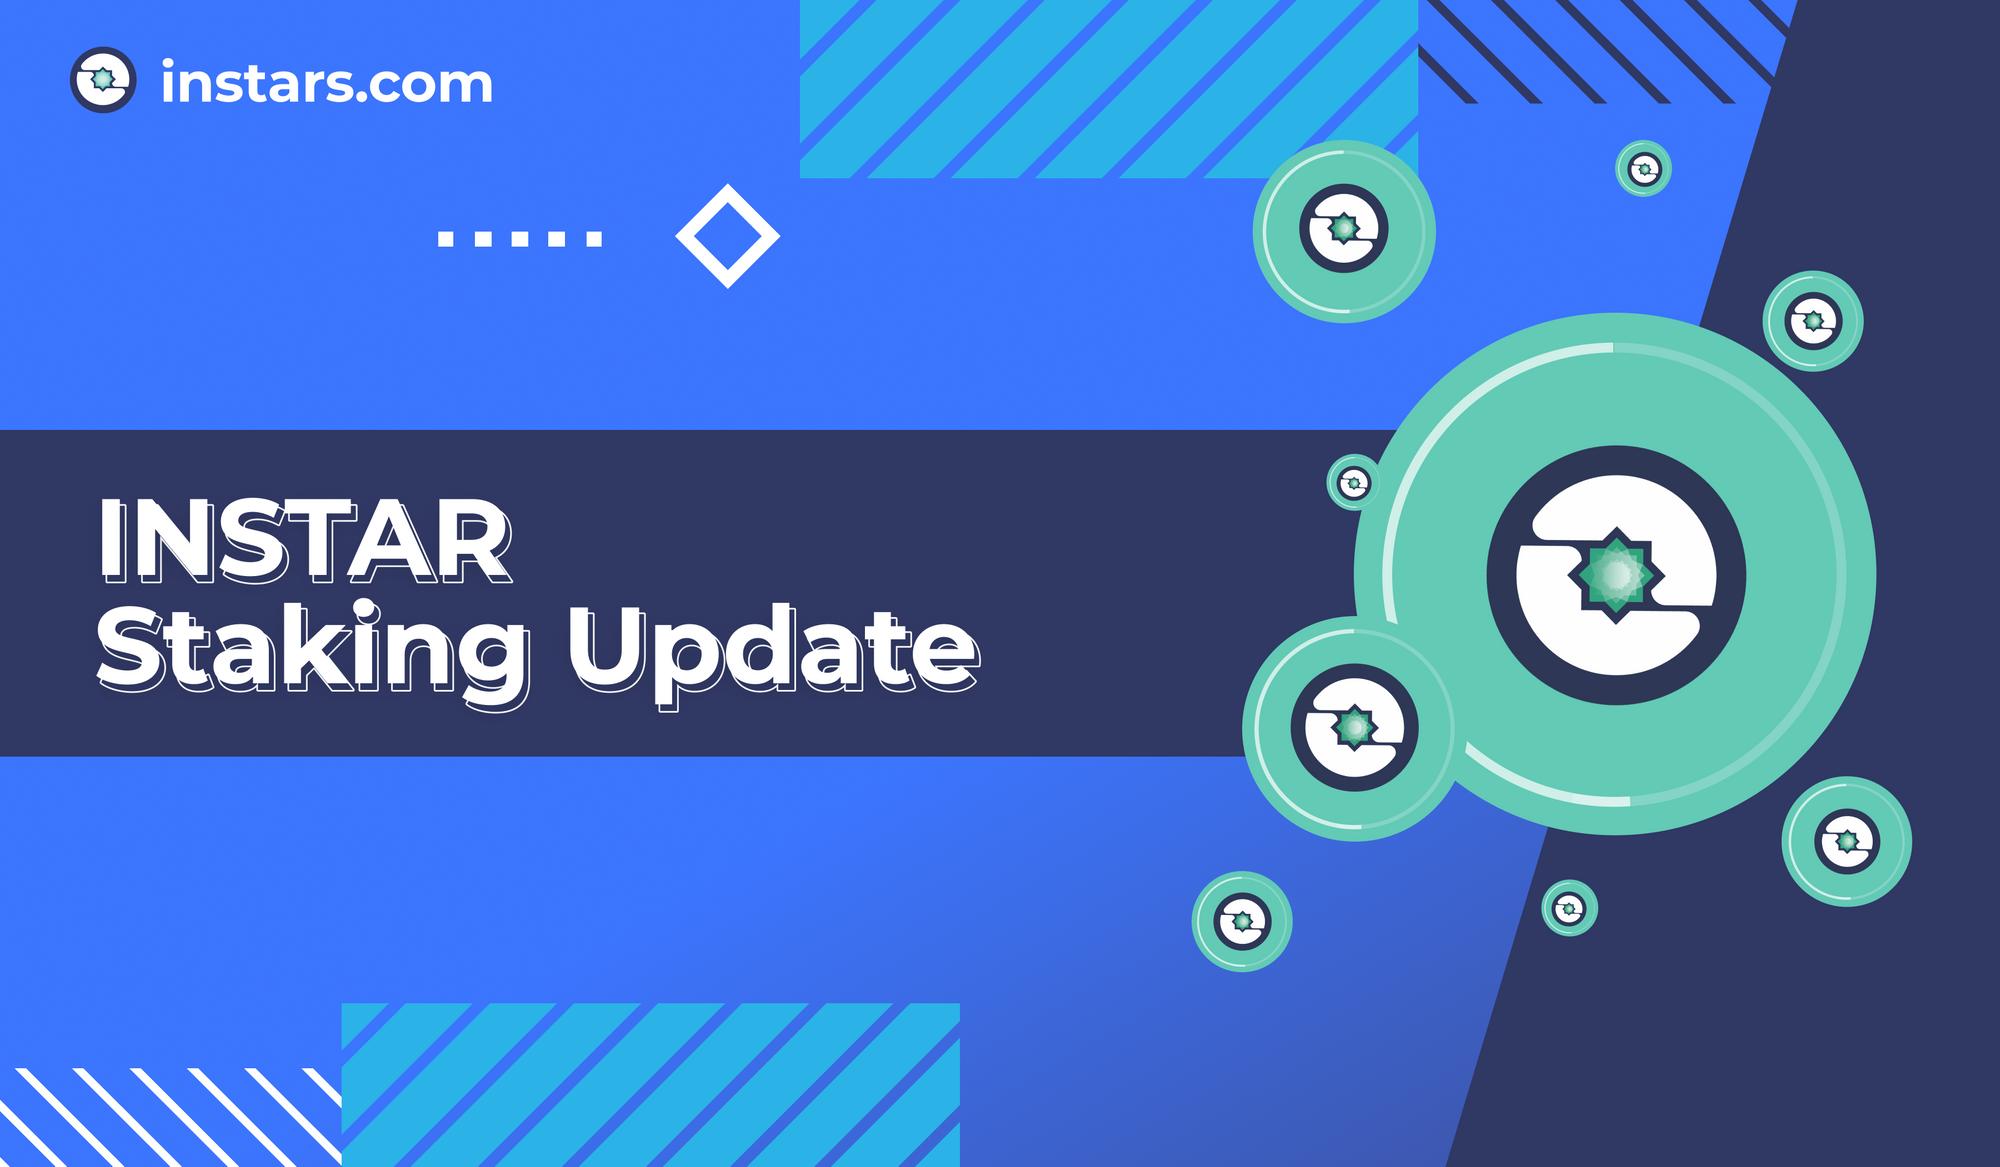 INSTAR Staking Update 💫